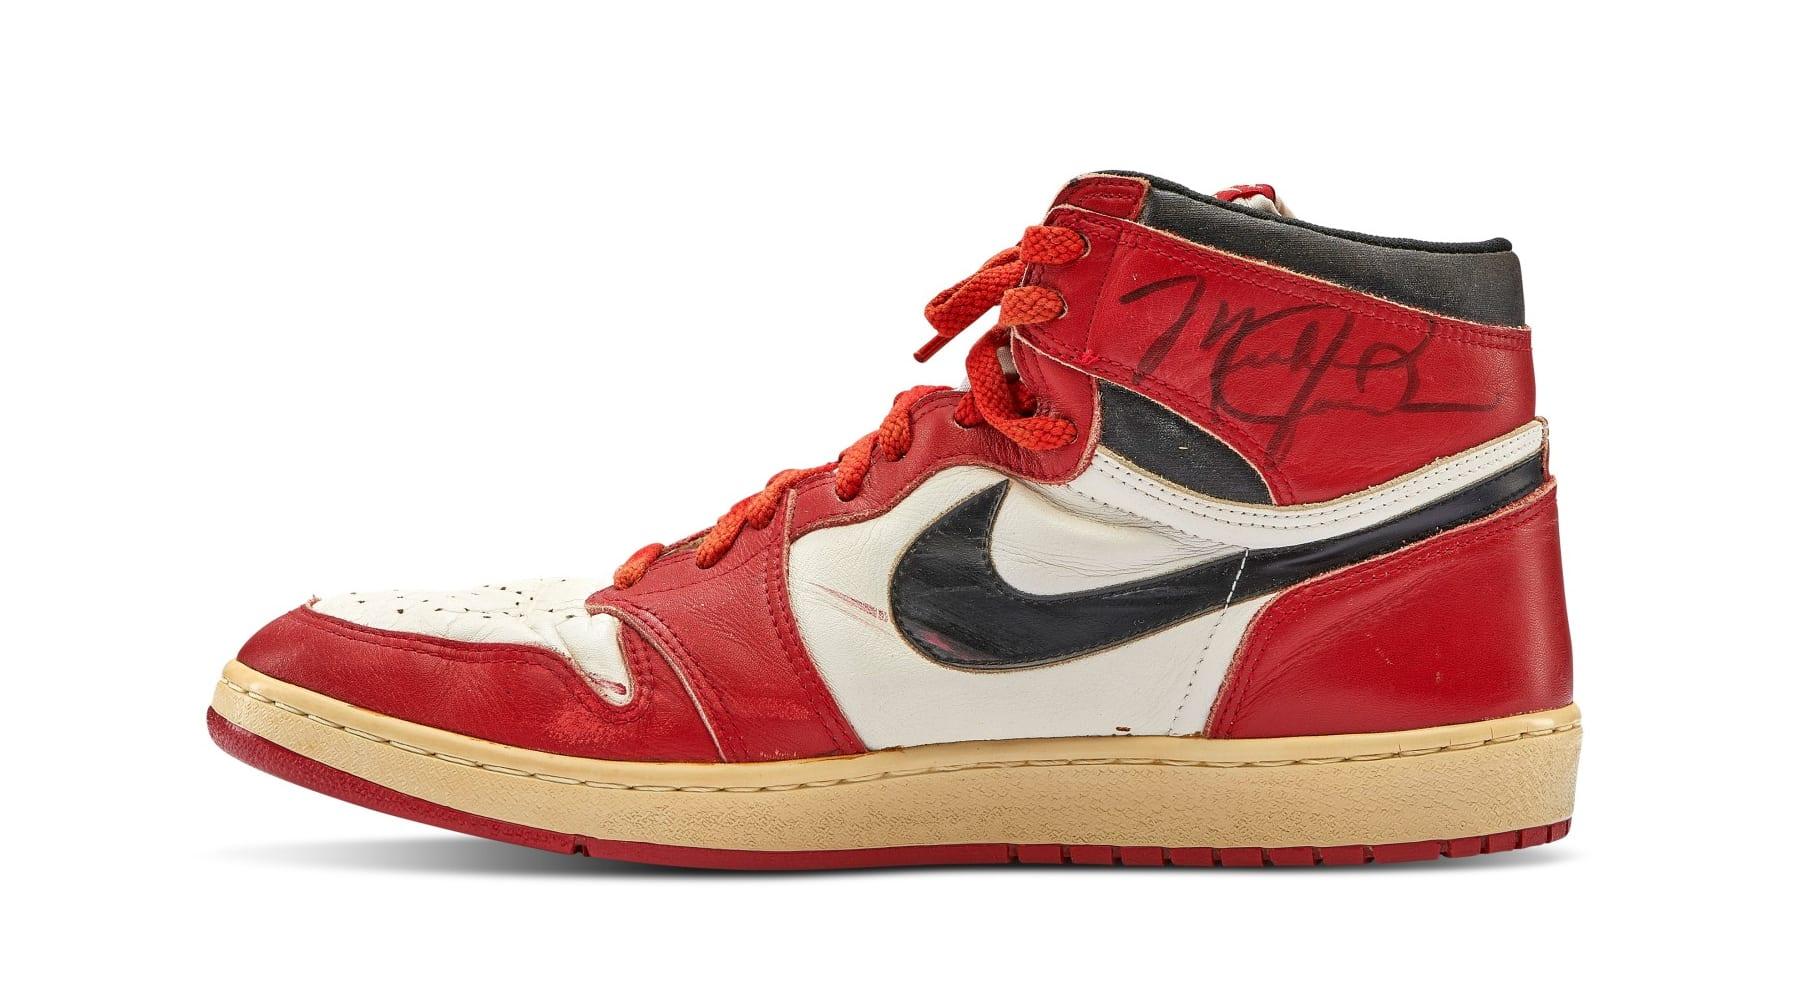 Michael Jordan Game Worn Autographed 1985 Air Jordan 1 High 'Chicago' Medial